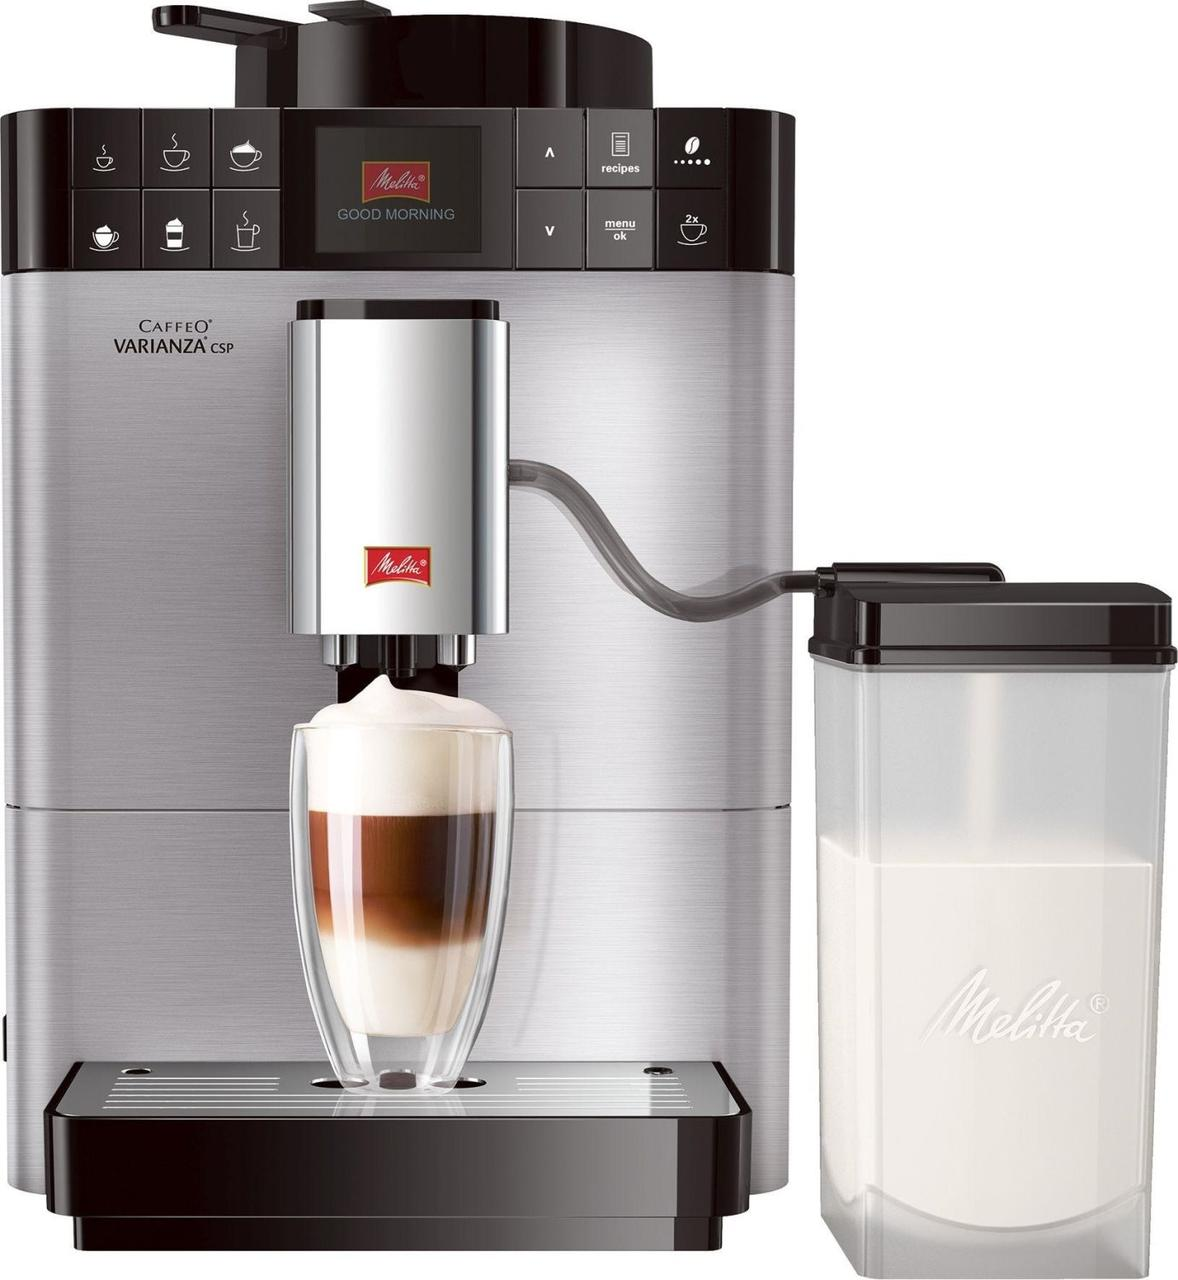 Кофемашина Melitta CAFFEO Varianza CSP F58/0-100 1450 Вт